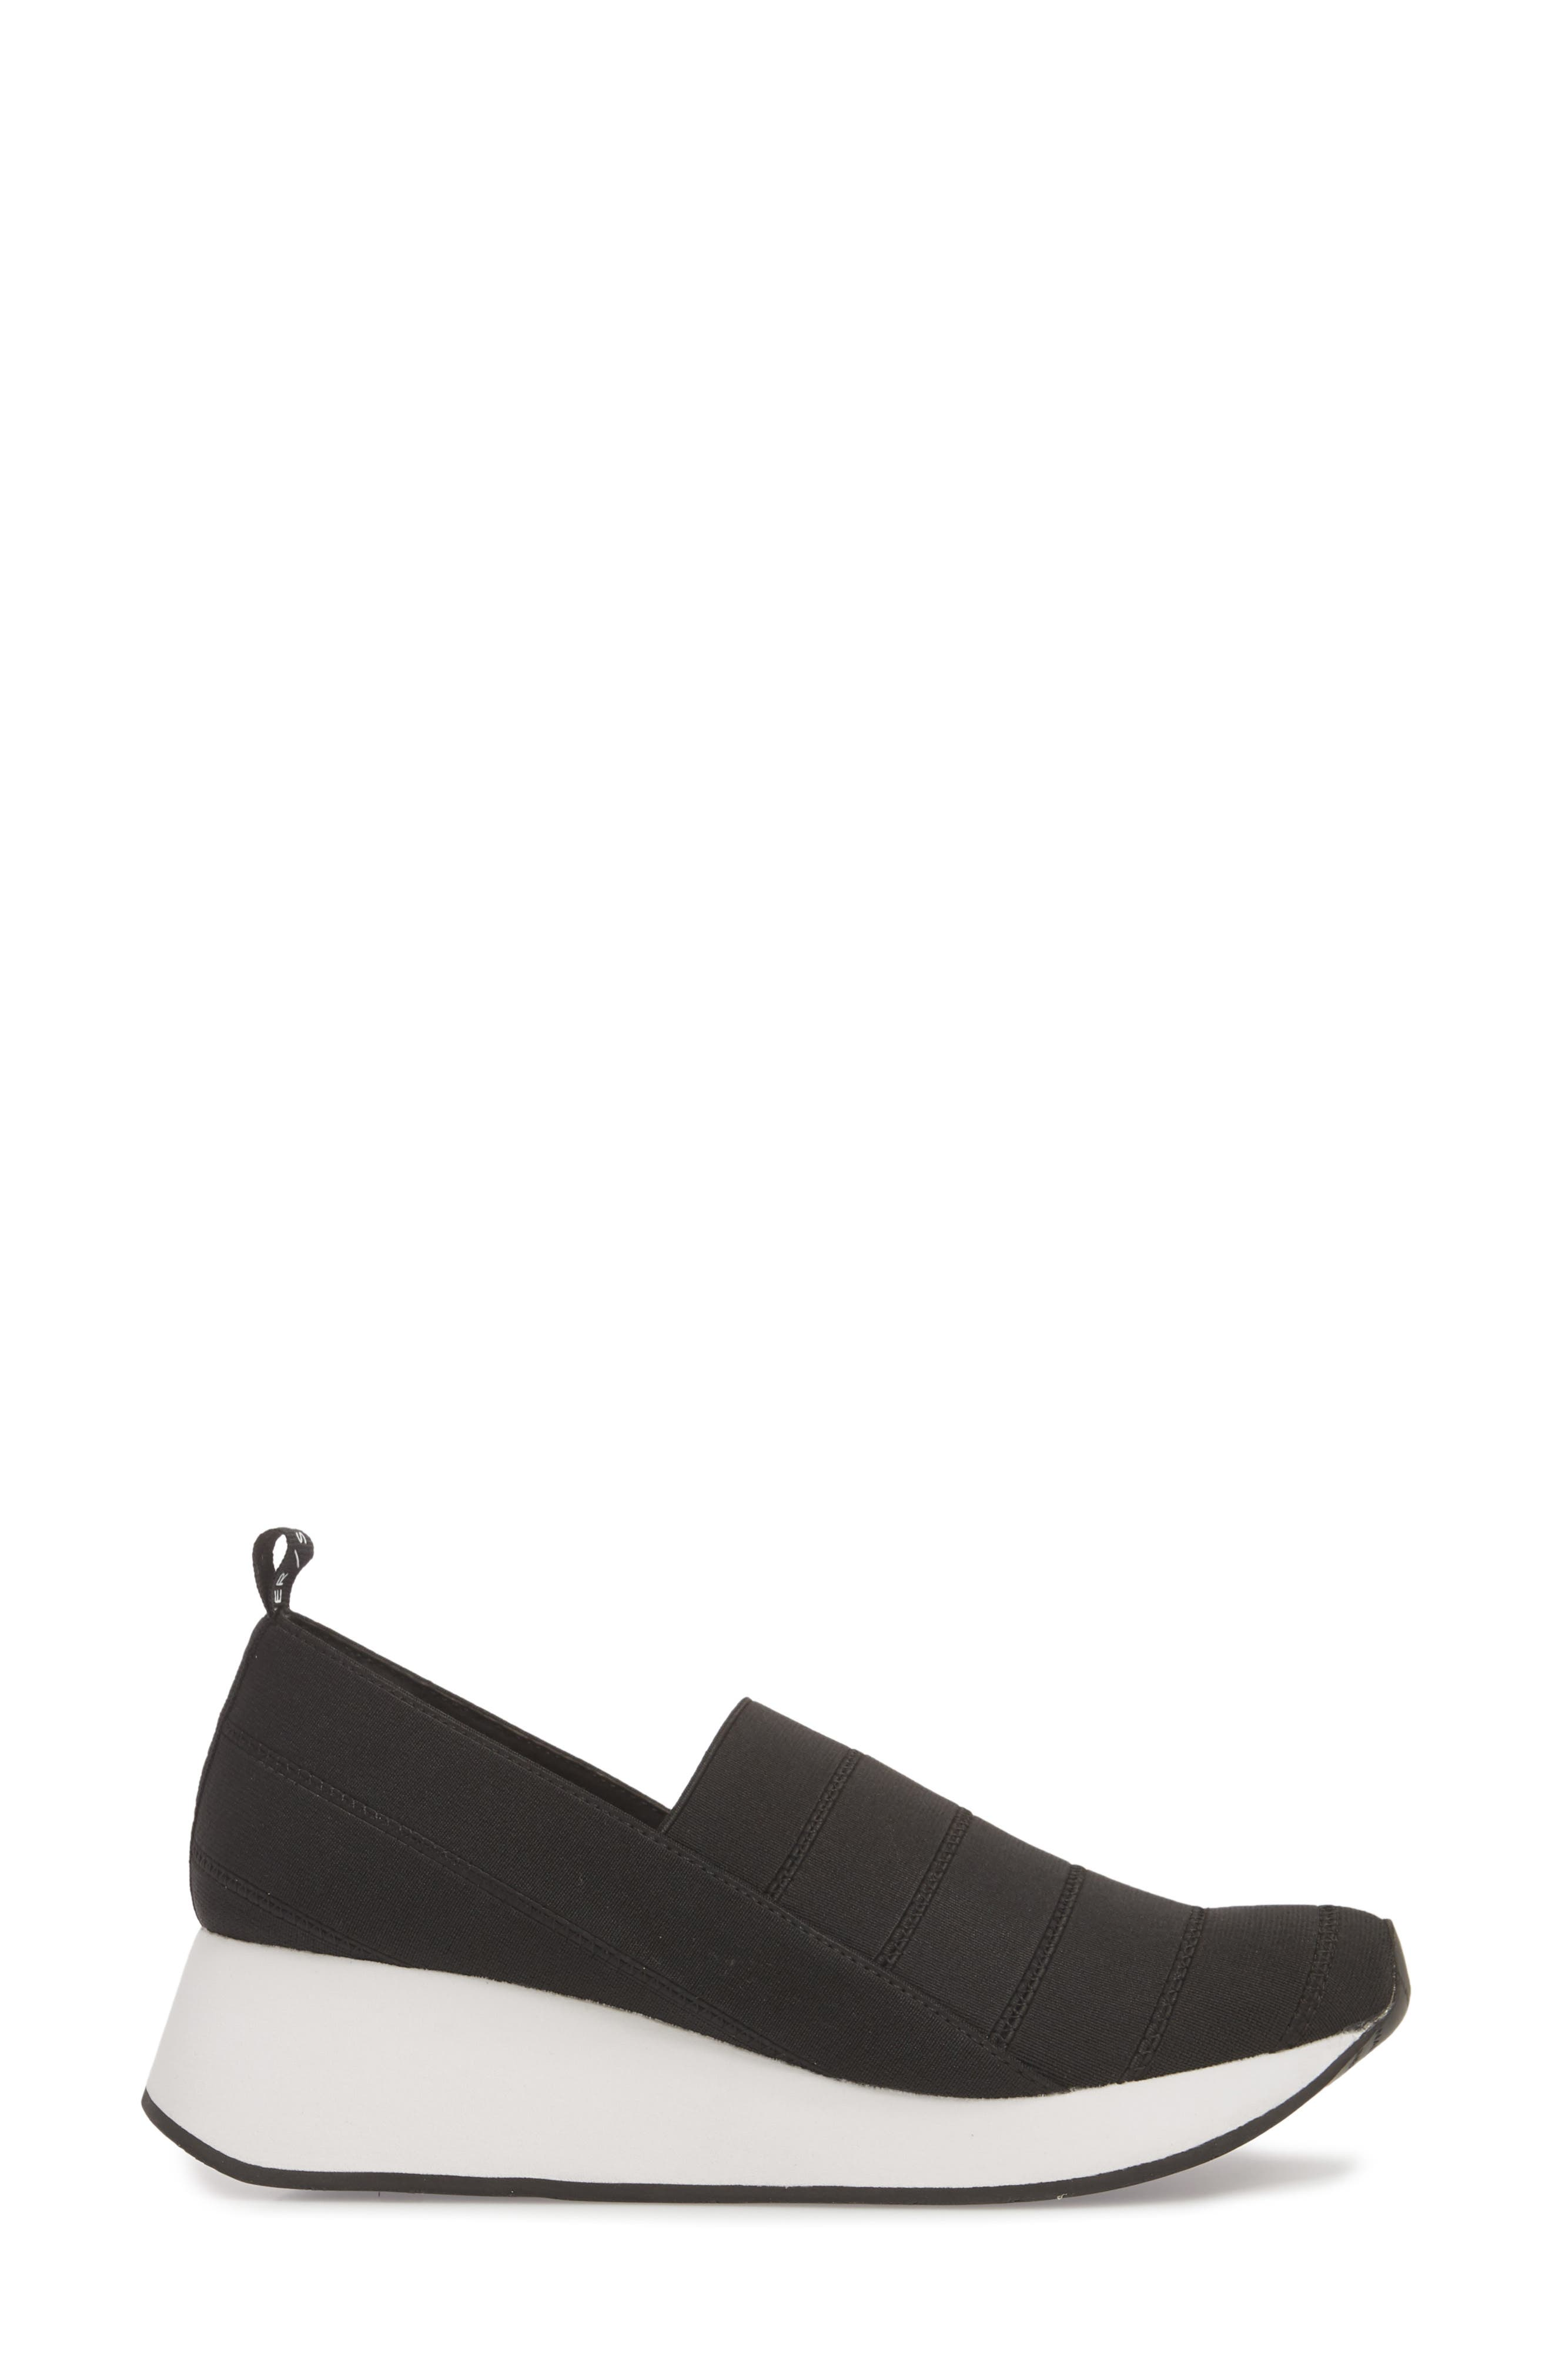 Piper Platform Slip-On Sneaker,                             Alternate thumbnail 3, color,                             BLACK STRETCH FABRIC